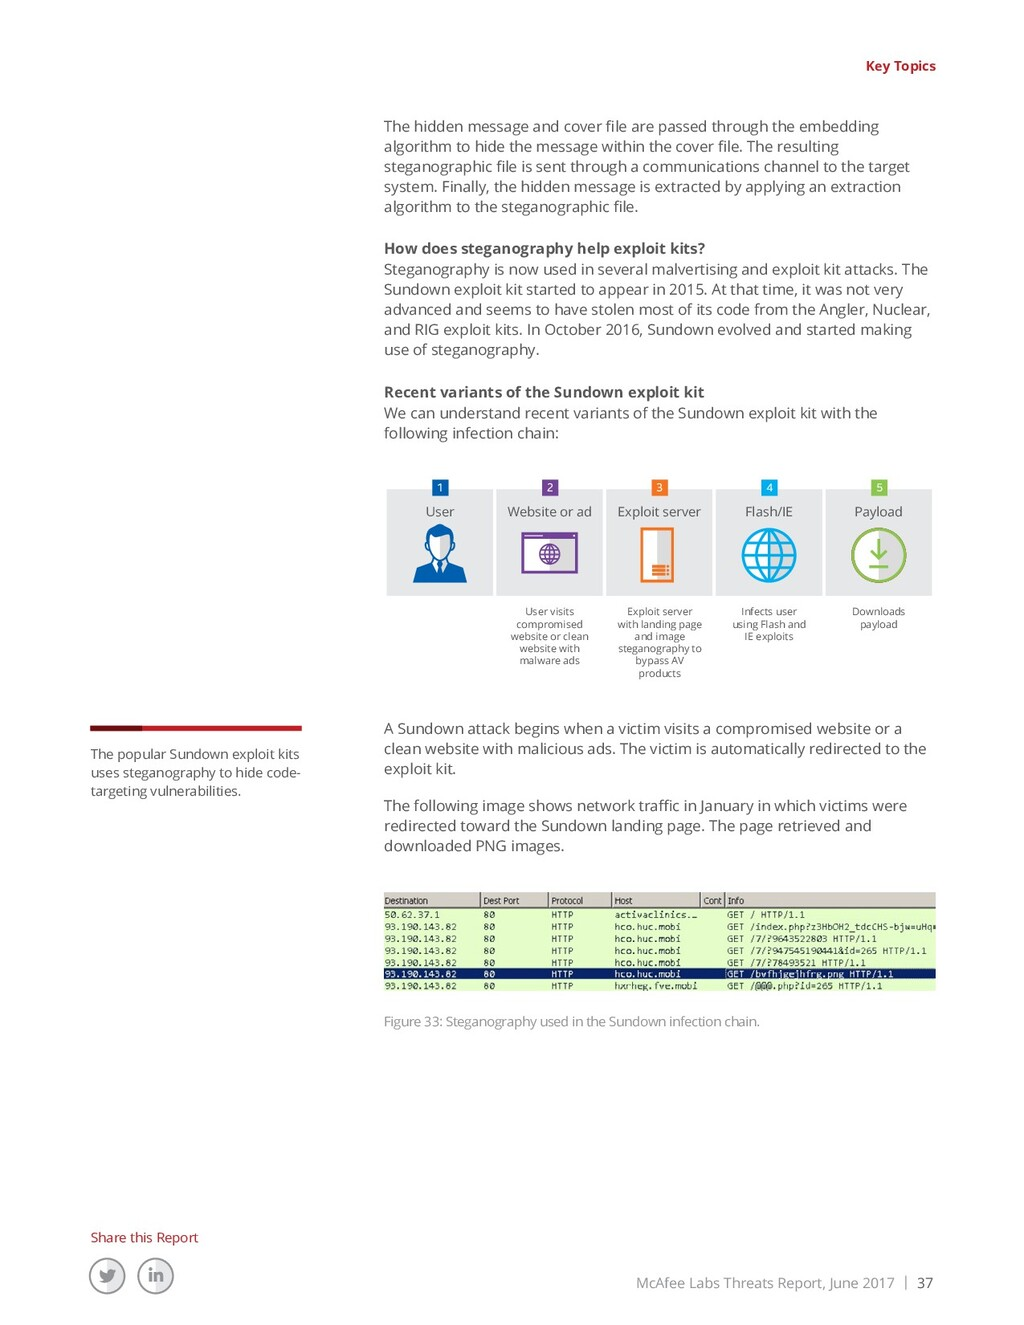 McAfee Labs Threats Report, June 2017 | 37 Shar...